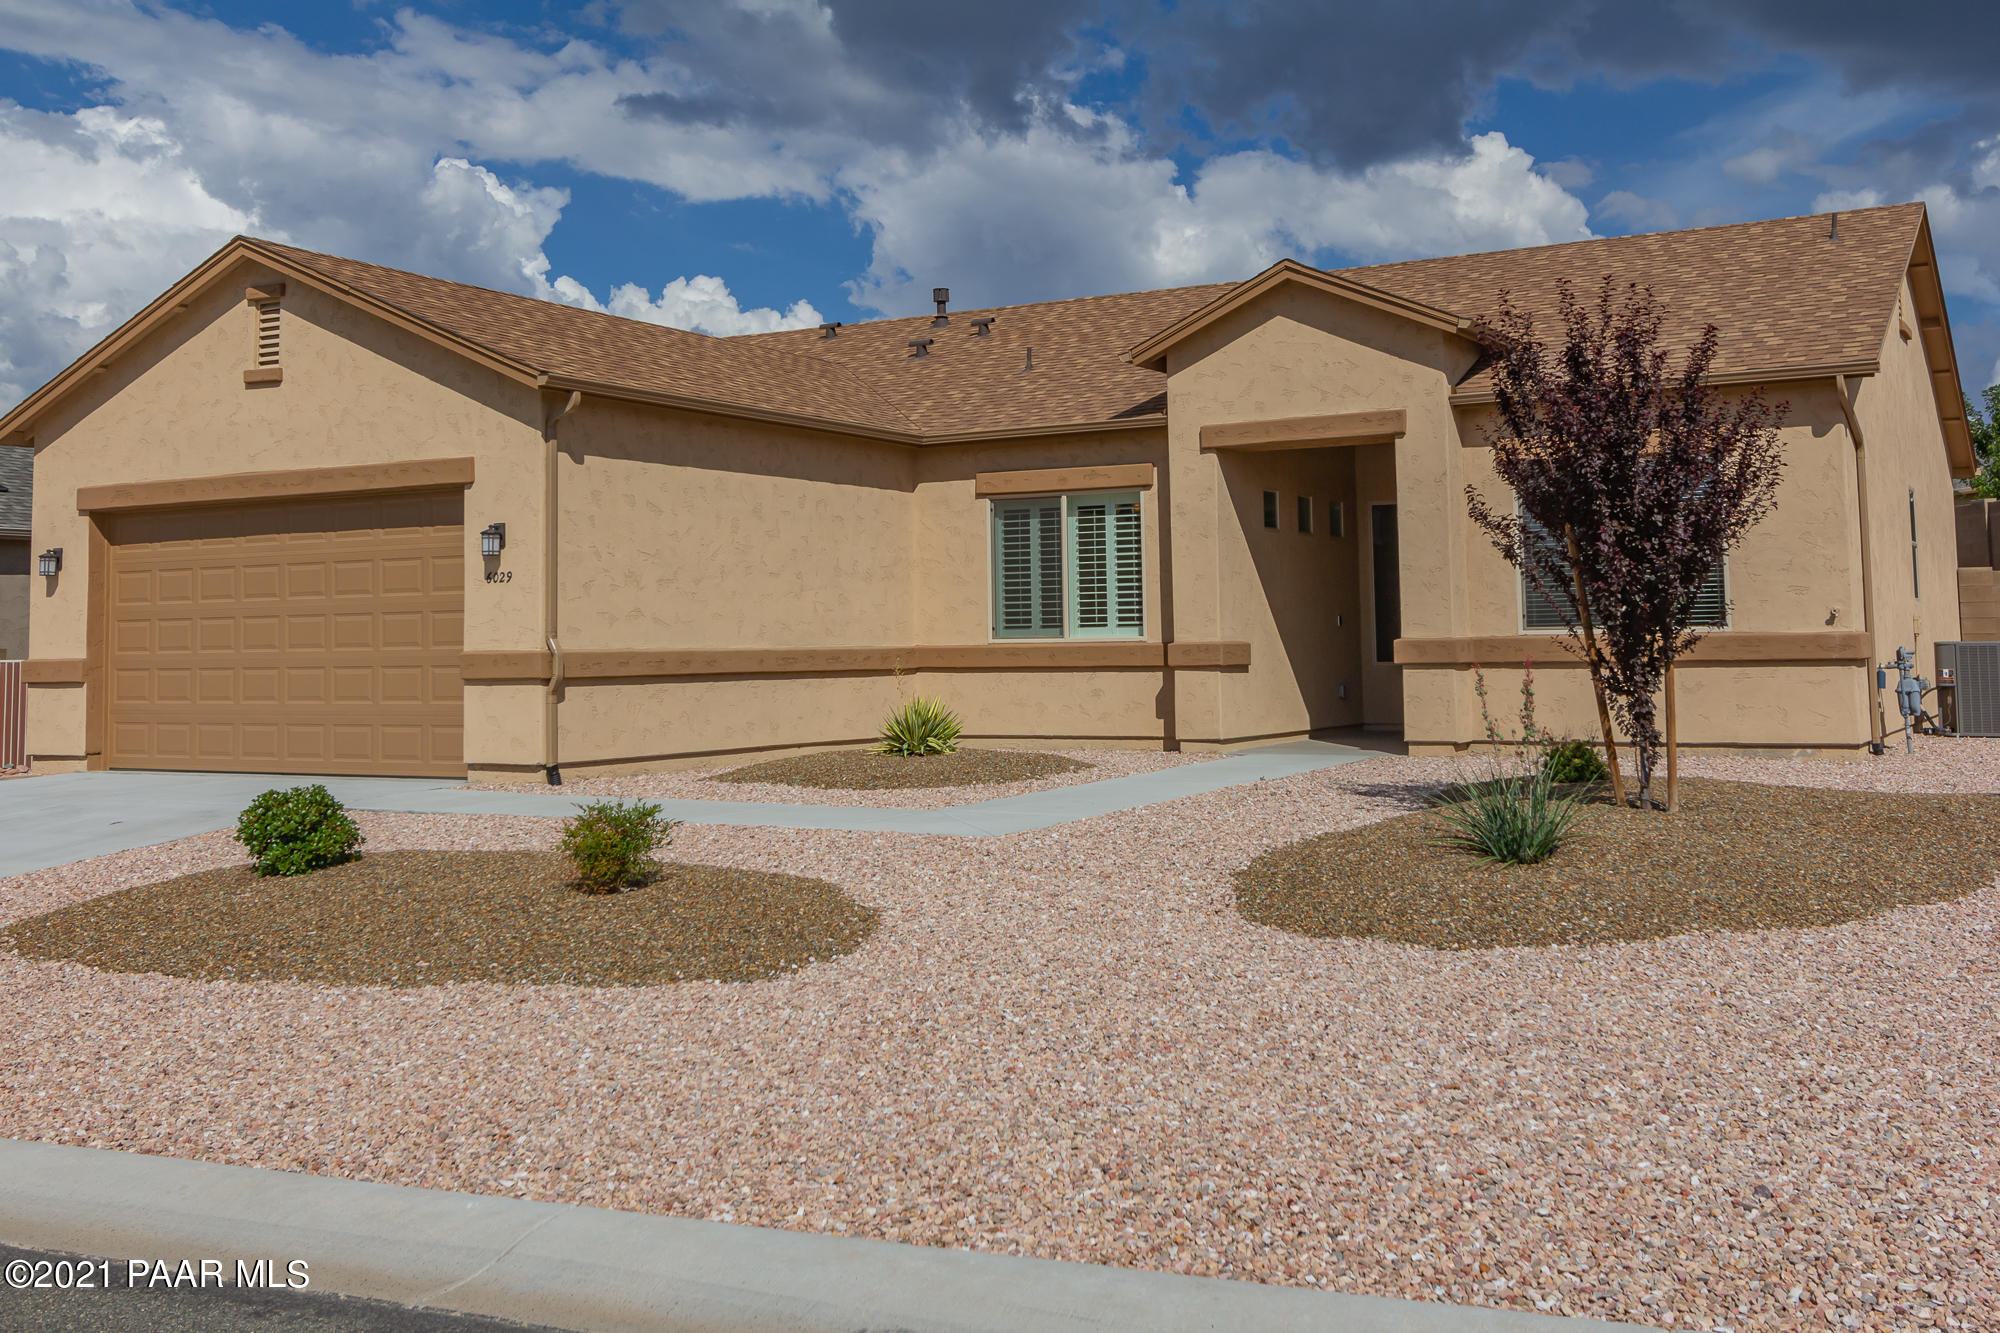 Photo of 6029 Beecher, Prescott Valley, AZ 86314